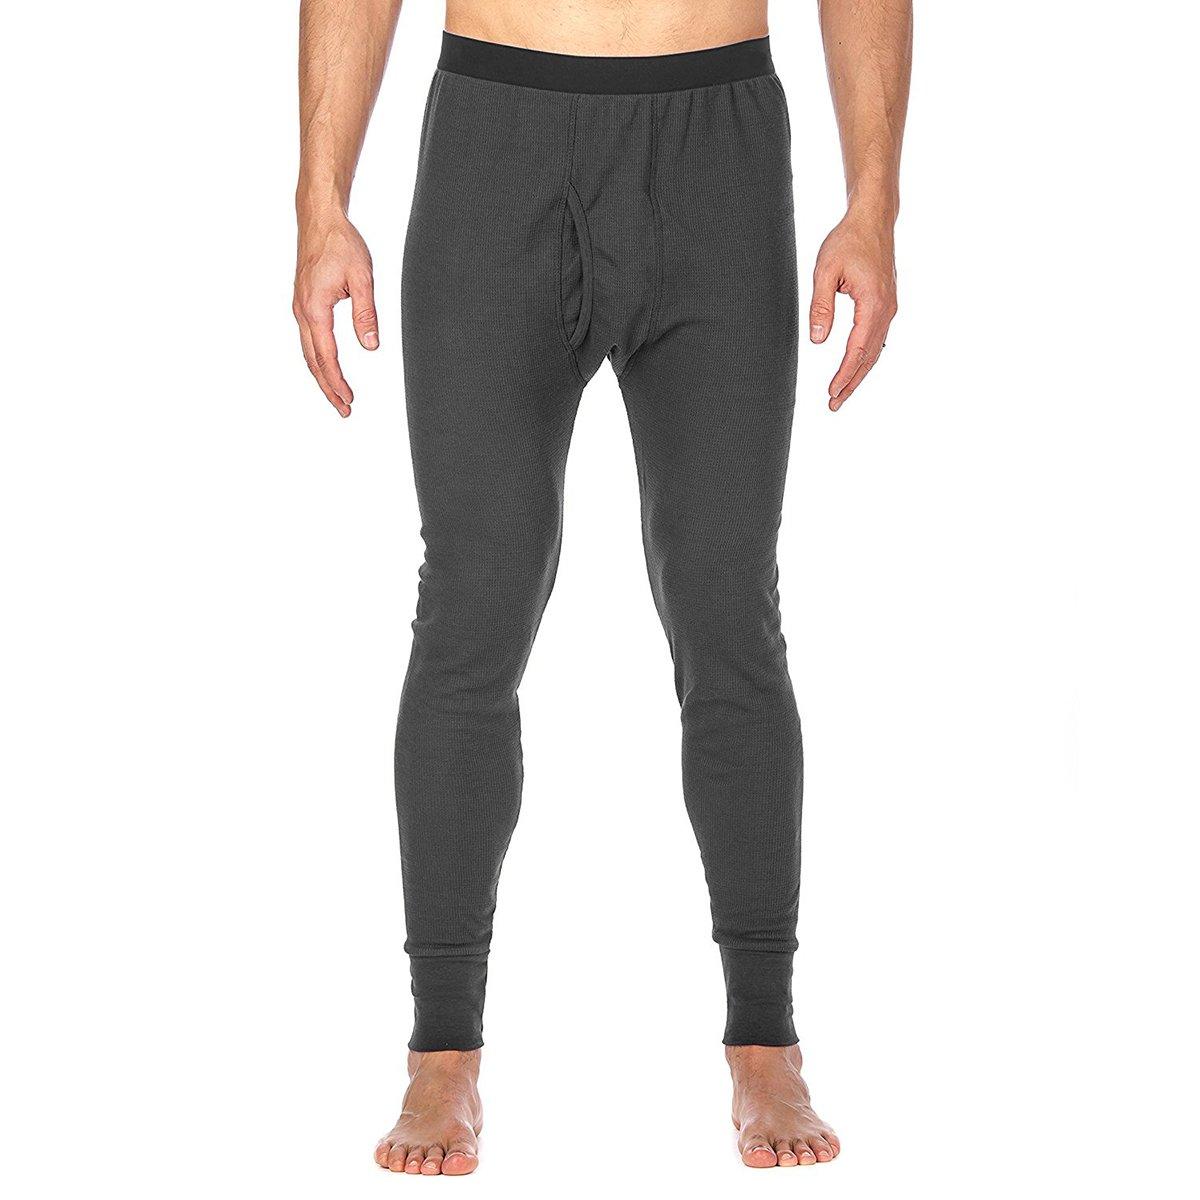 St. Johns Bay Men's Thermal Underwear Pant Light Base Layer Long Johns, Dark Gray, Medium